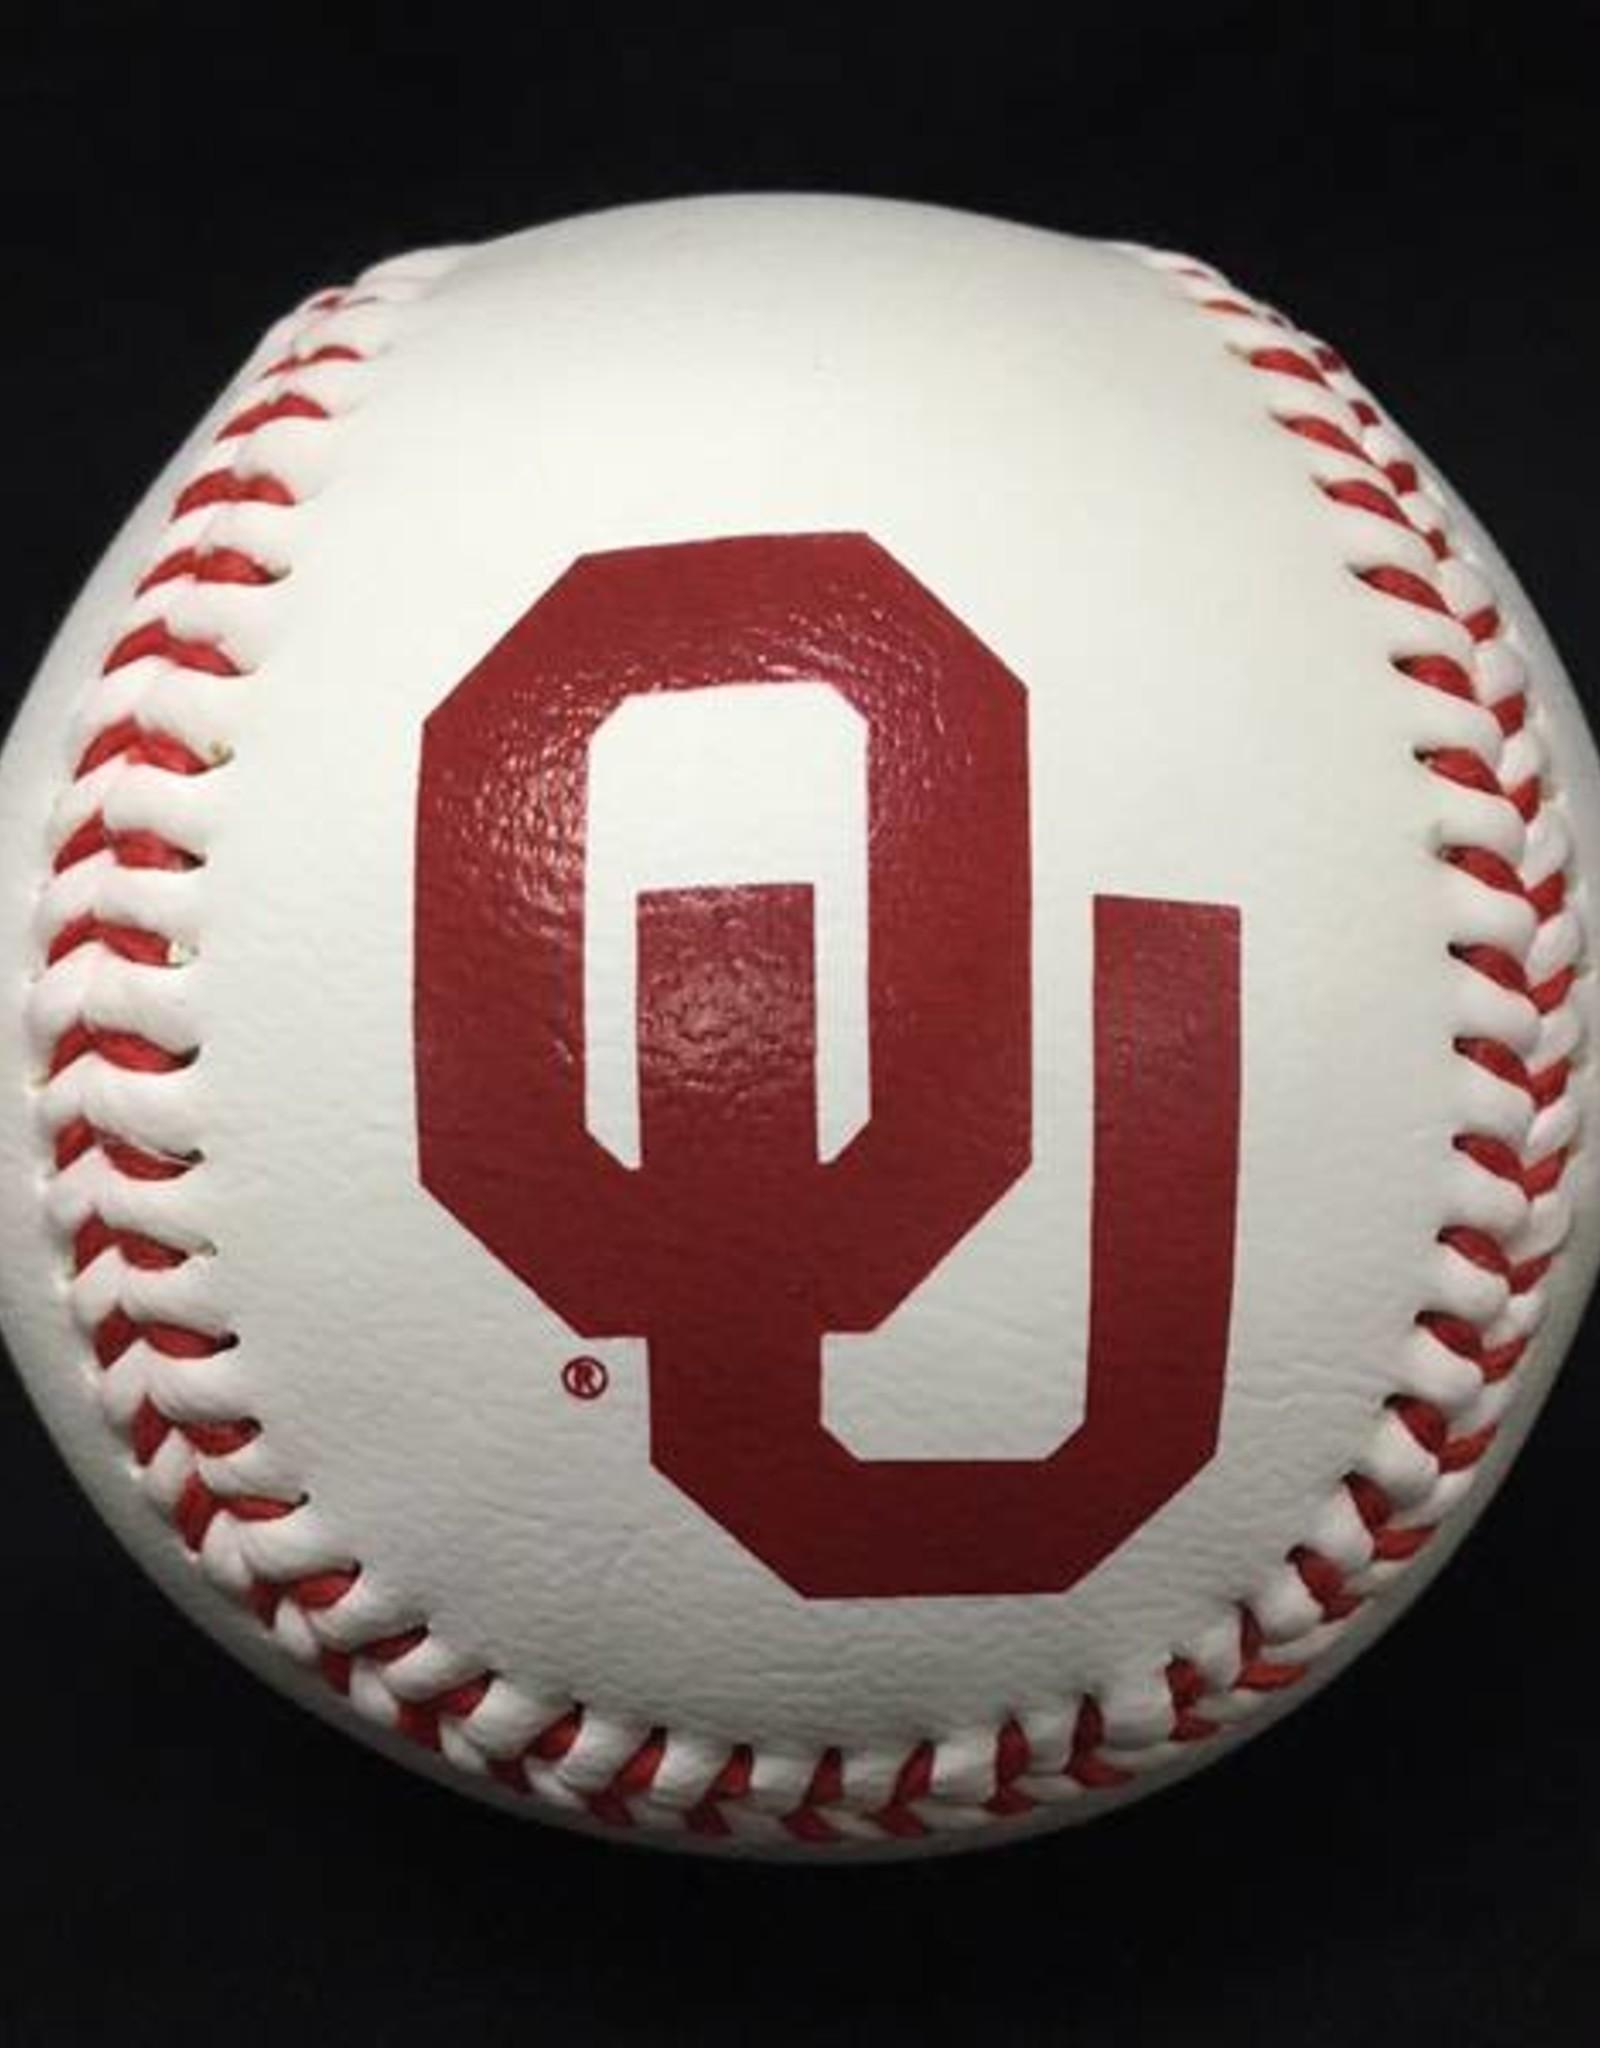 Gamemaster OU Official Size Baseball